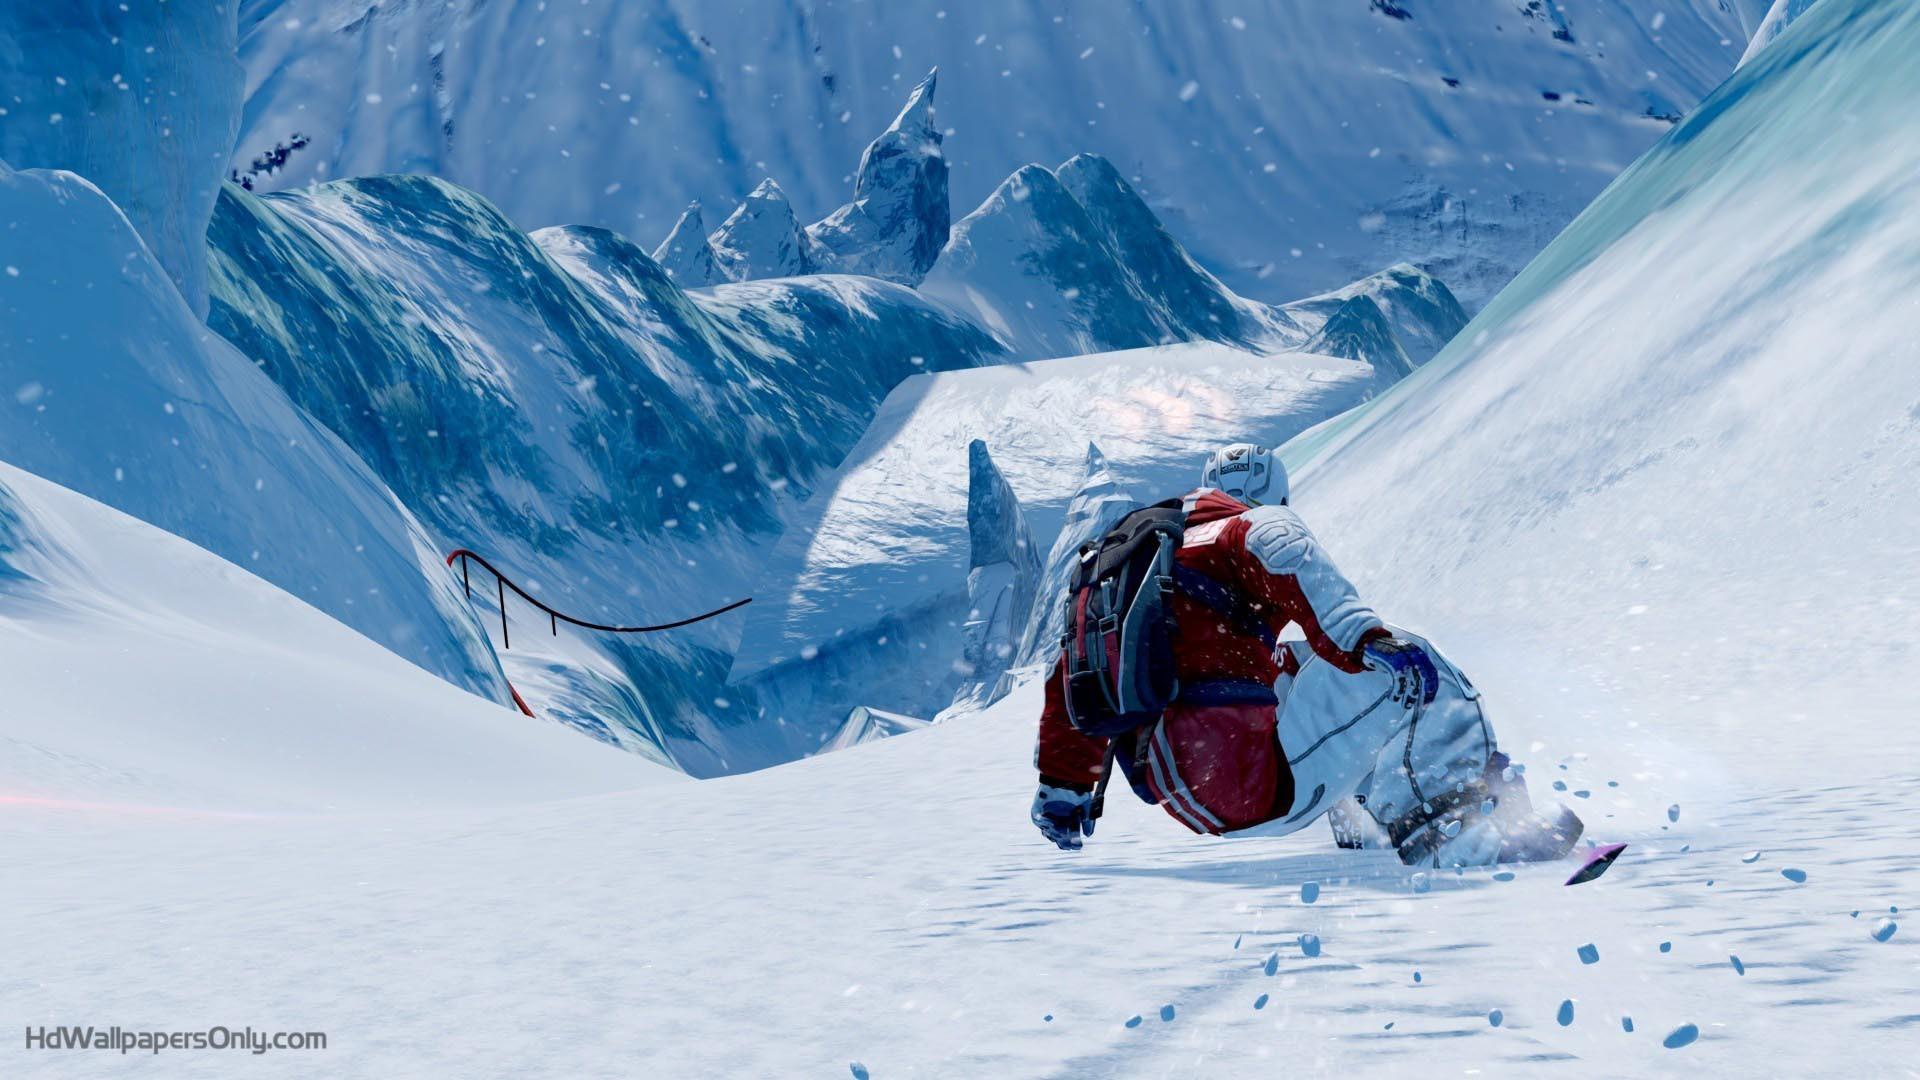 Snowboarding Wallpaper Hd Image Photo For Dekstop 47403 Label .